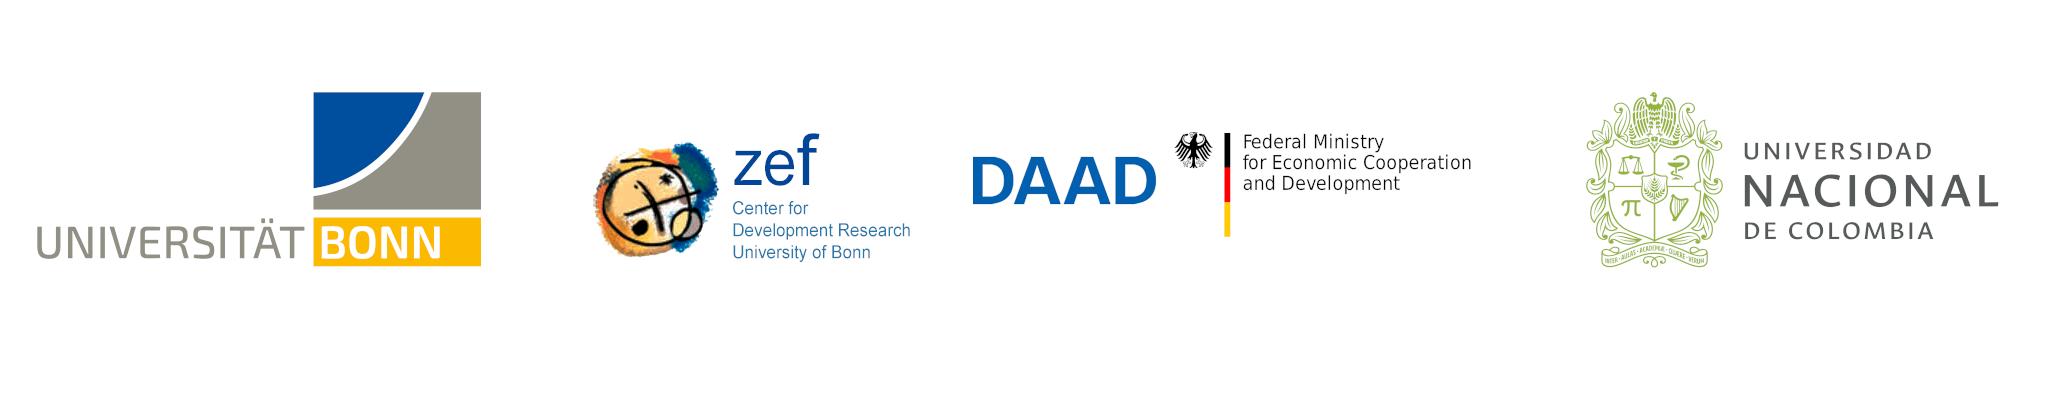 U. de Bonn, ZEF, DAAD, BMBF, UNAL